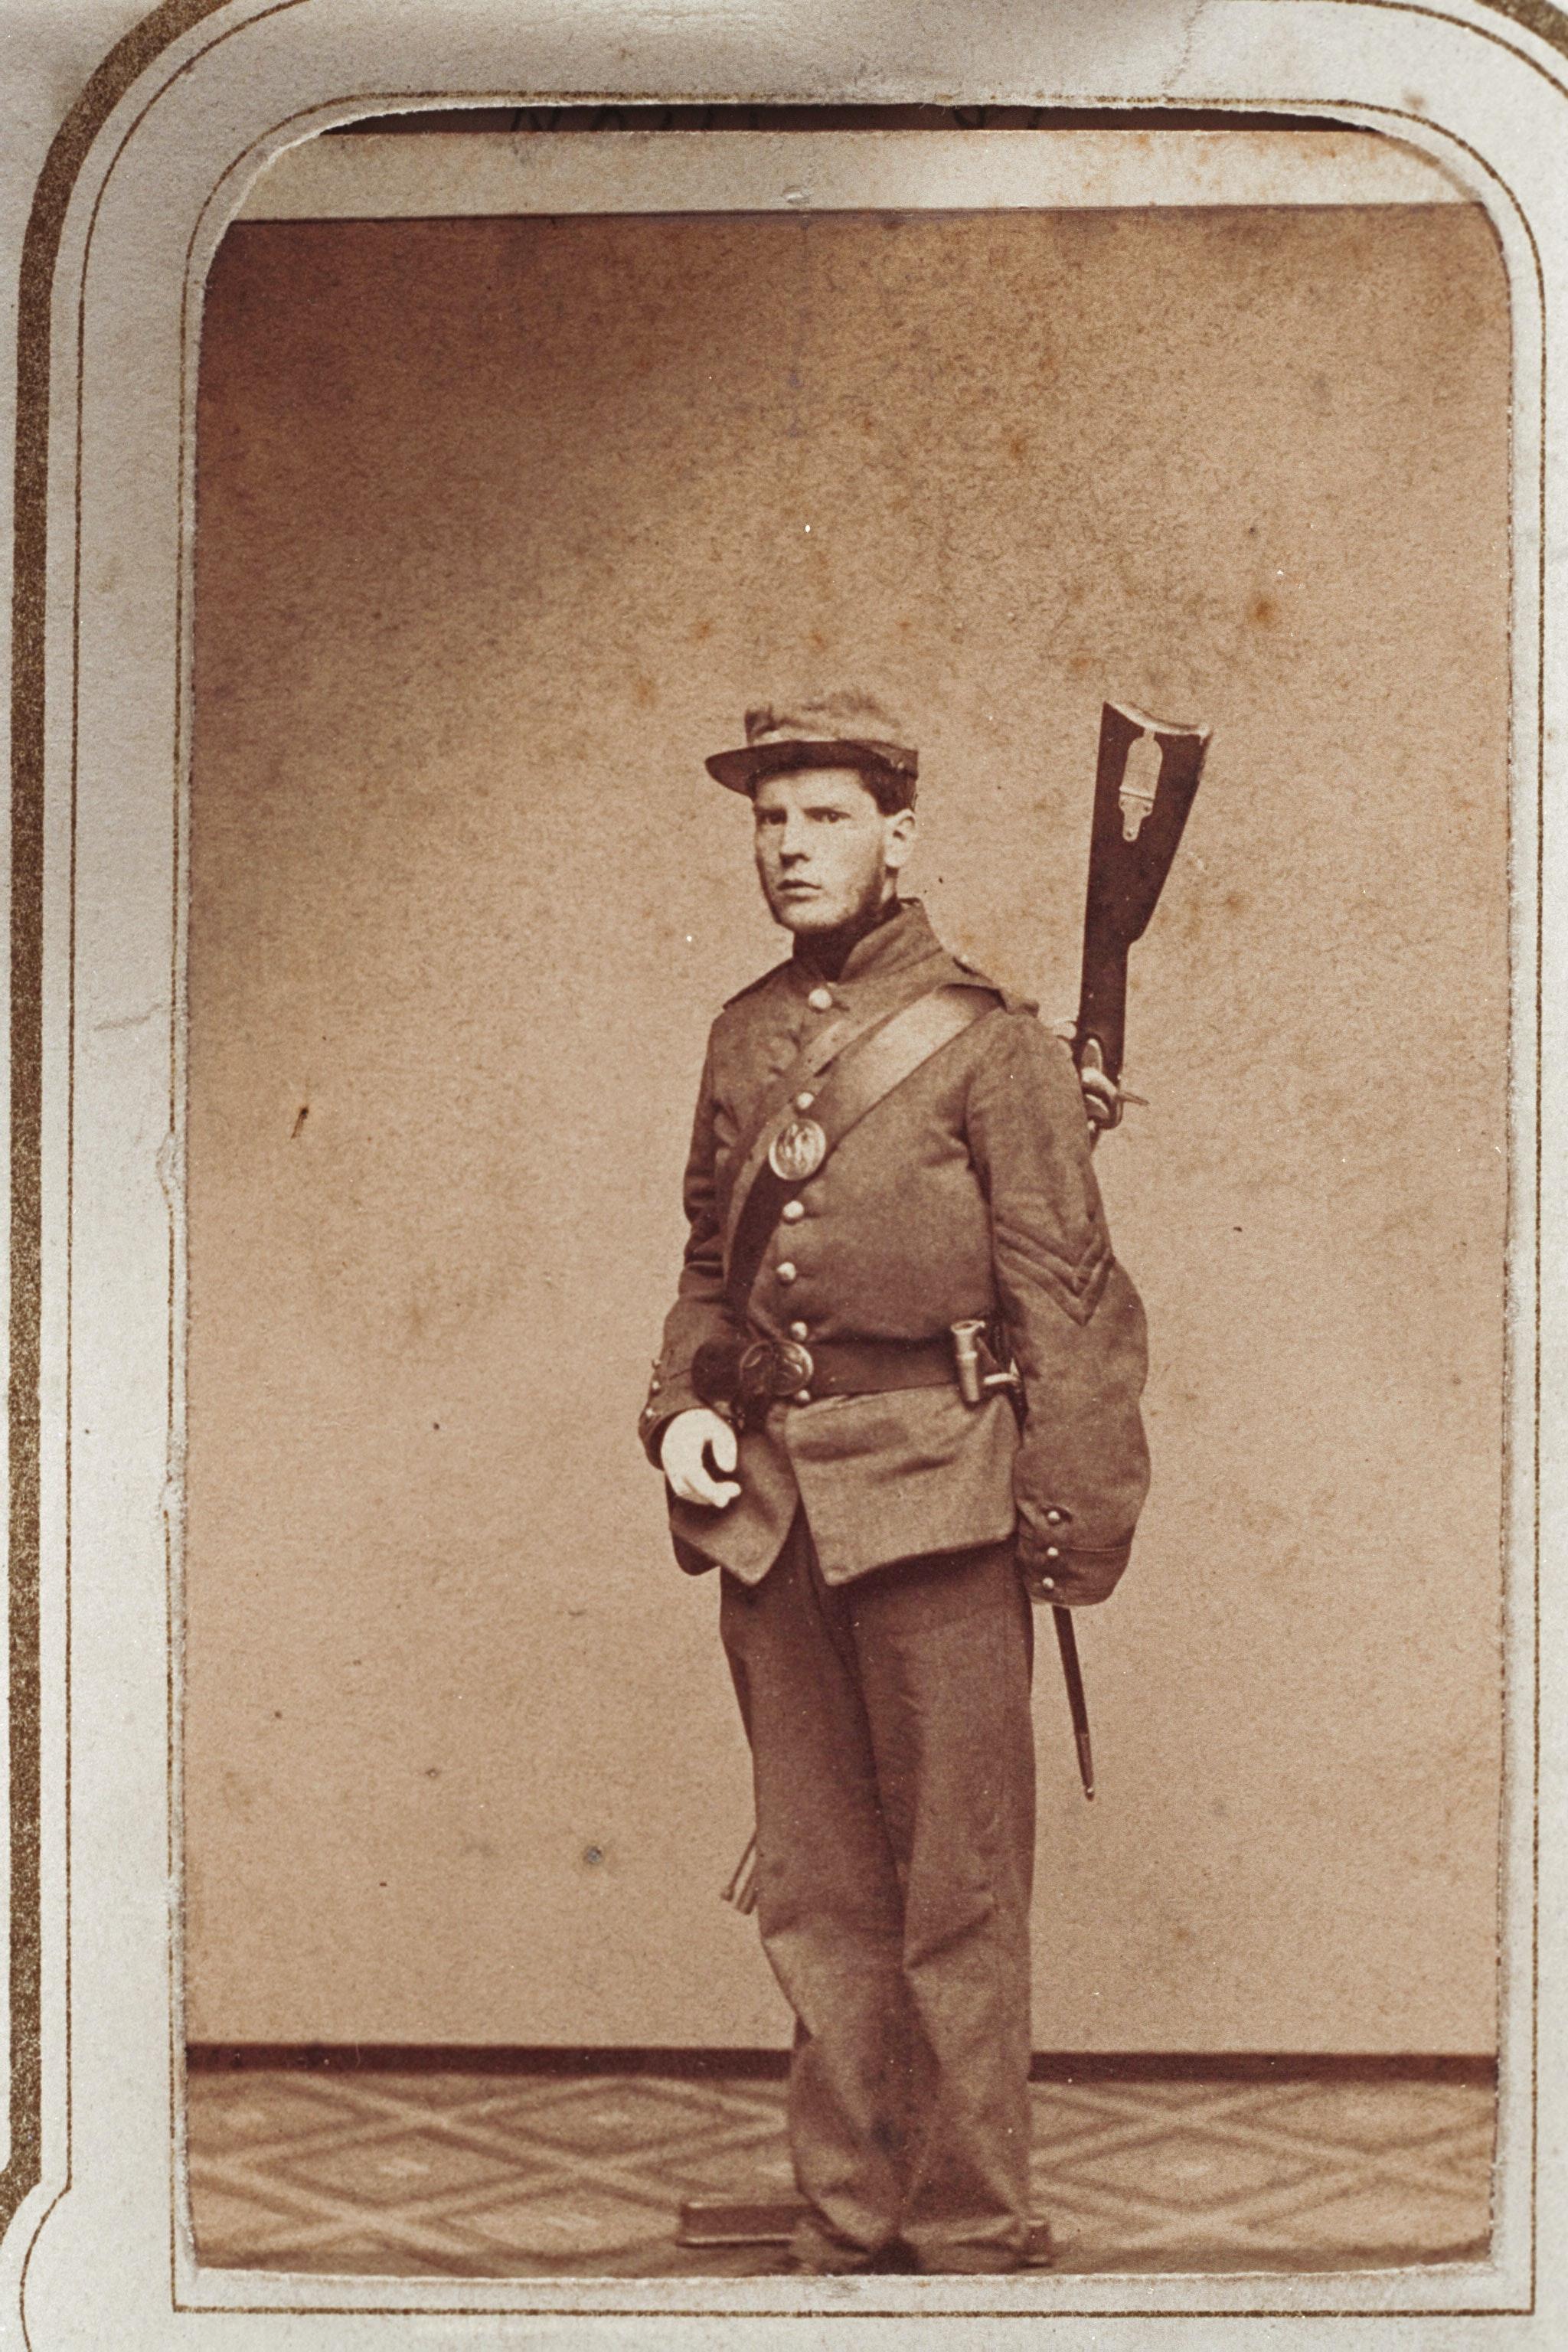 Fred Stowe in uniform